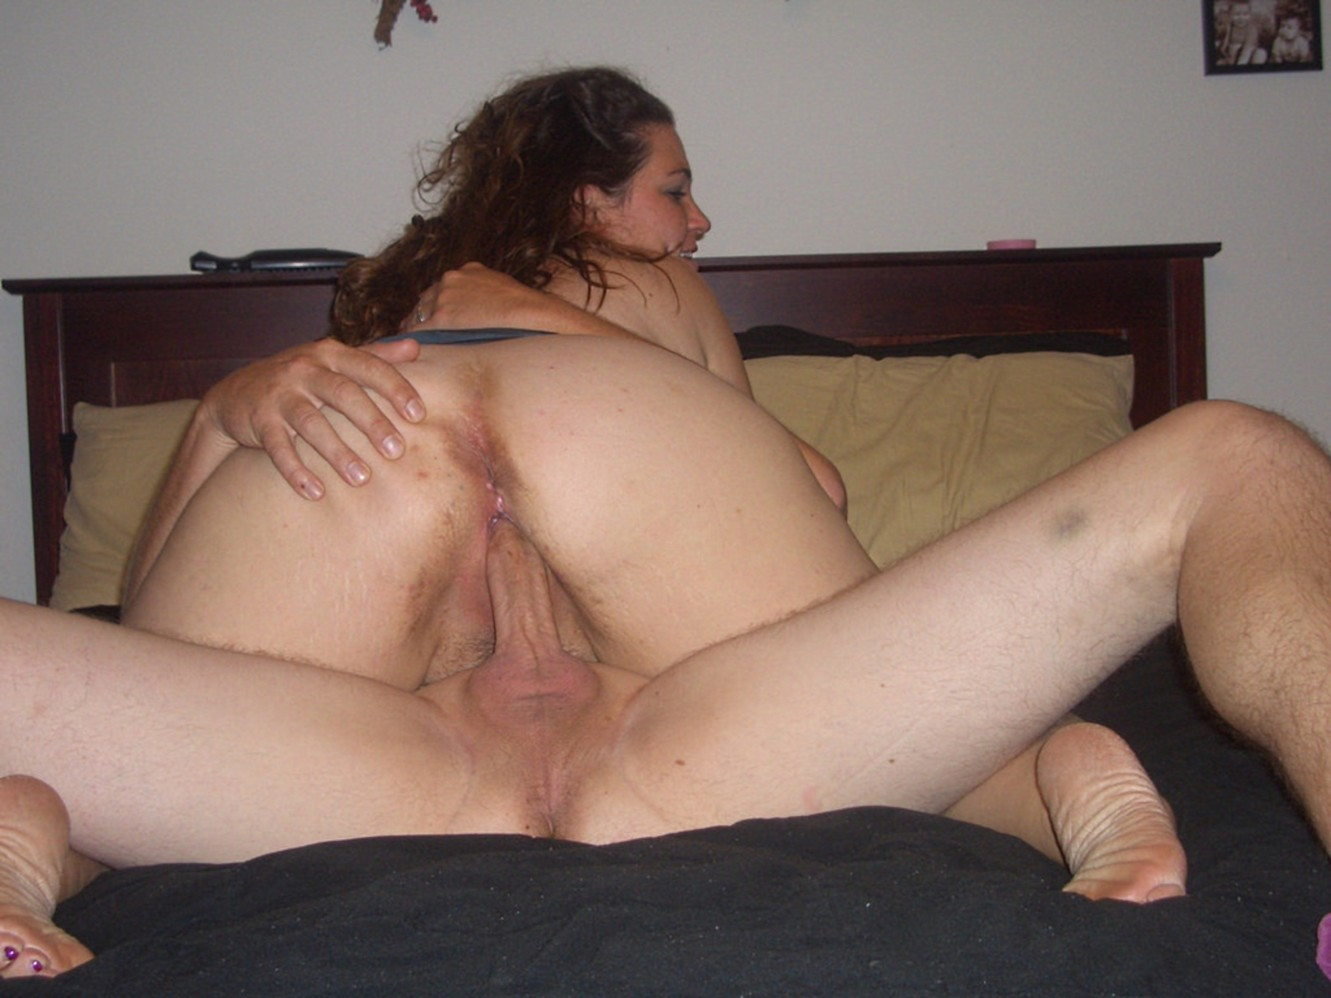 Просто фото домашнего секса - компиляция 8